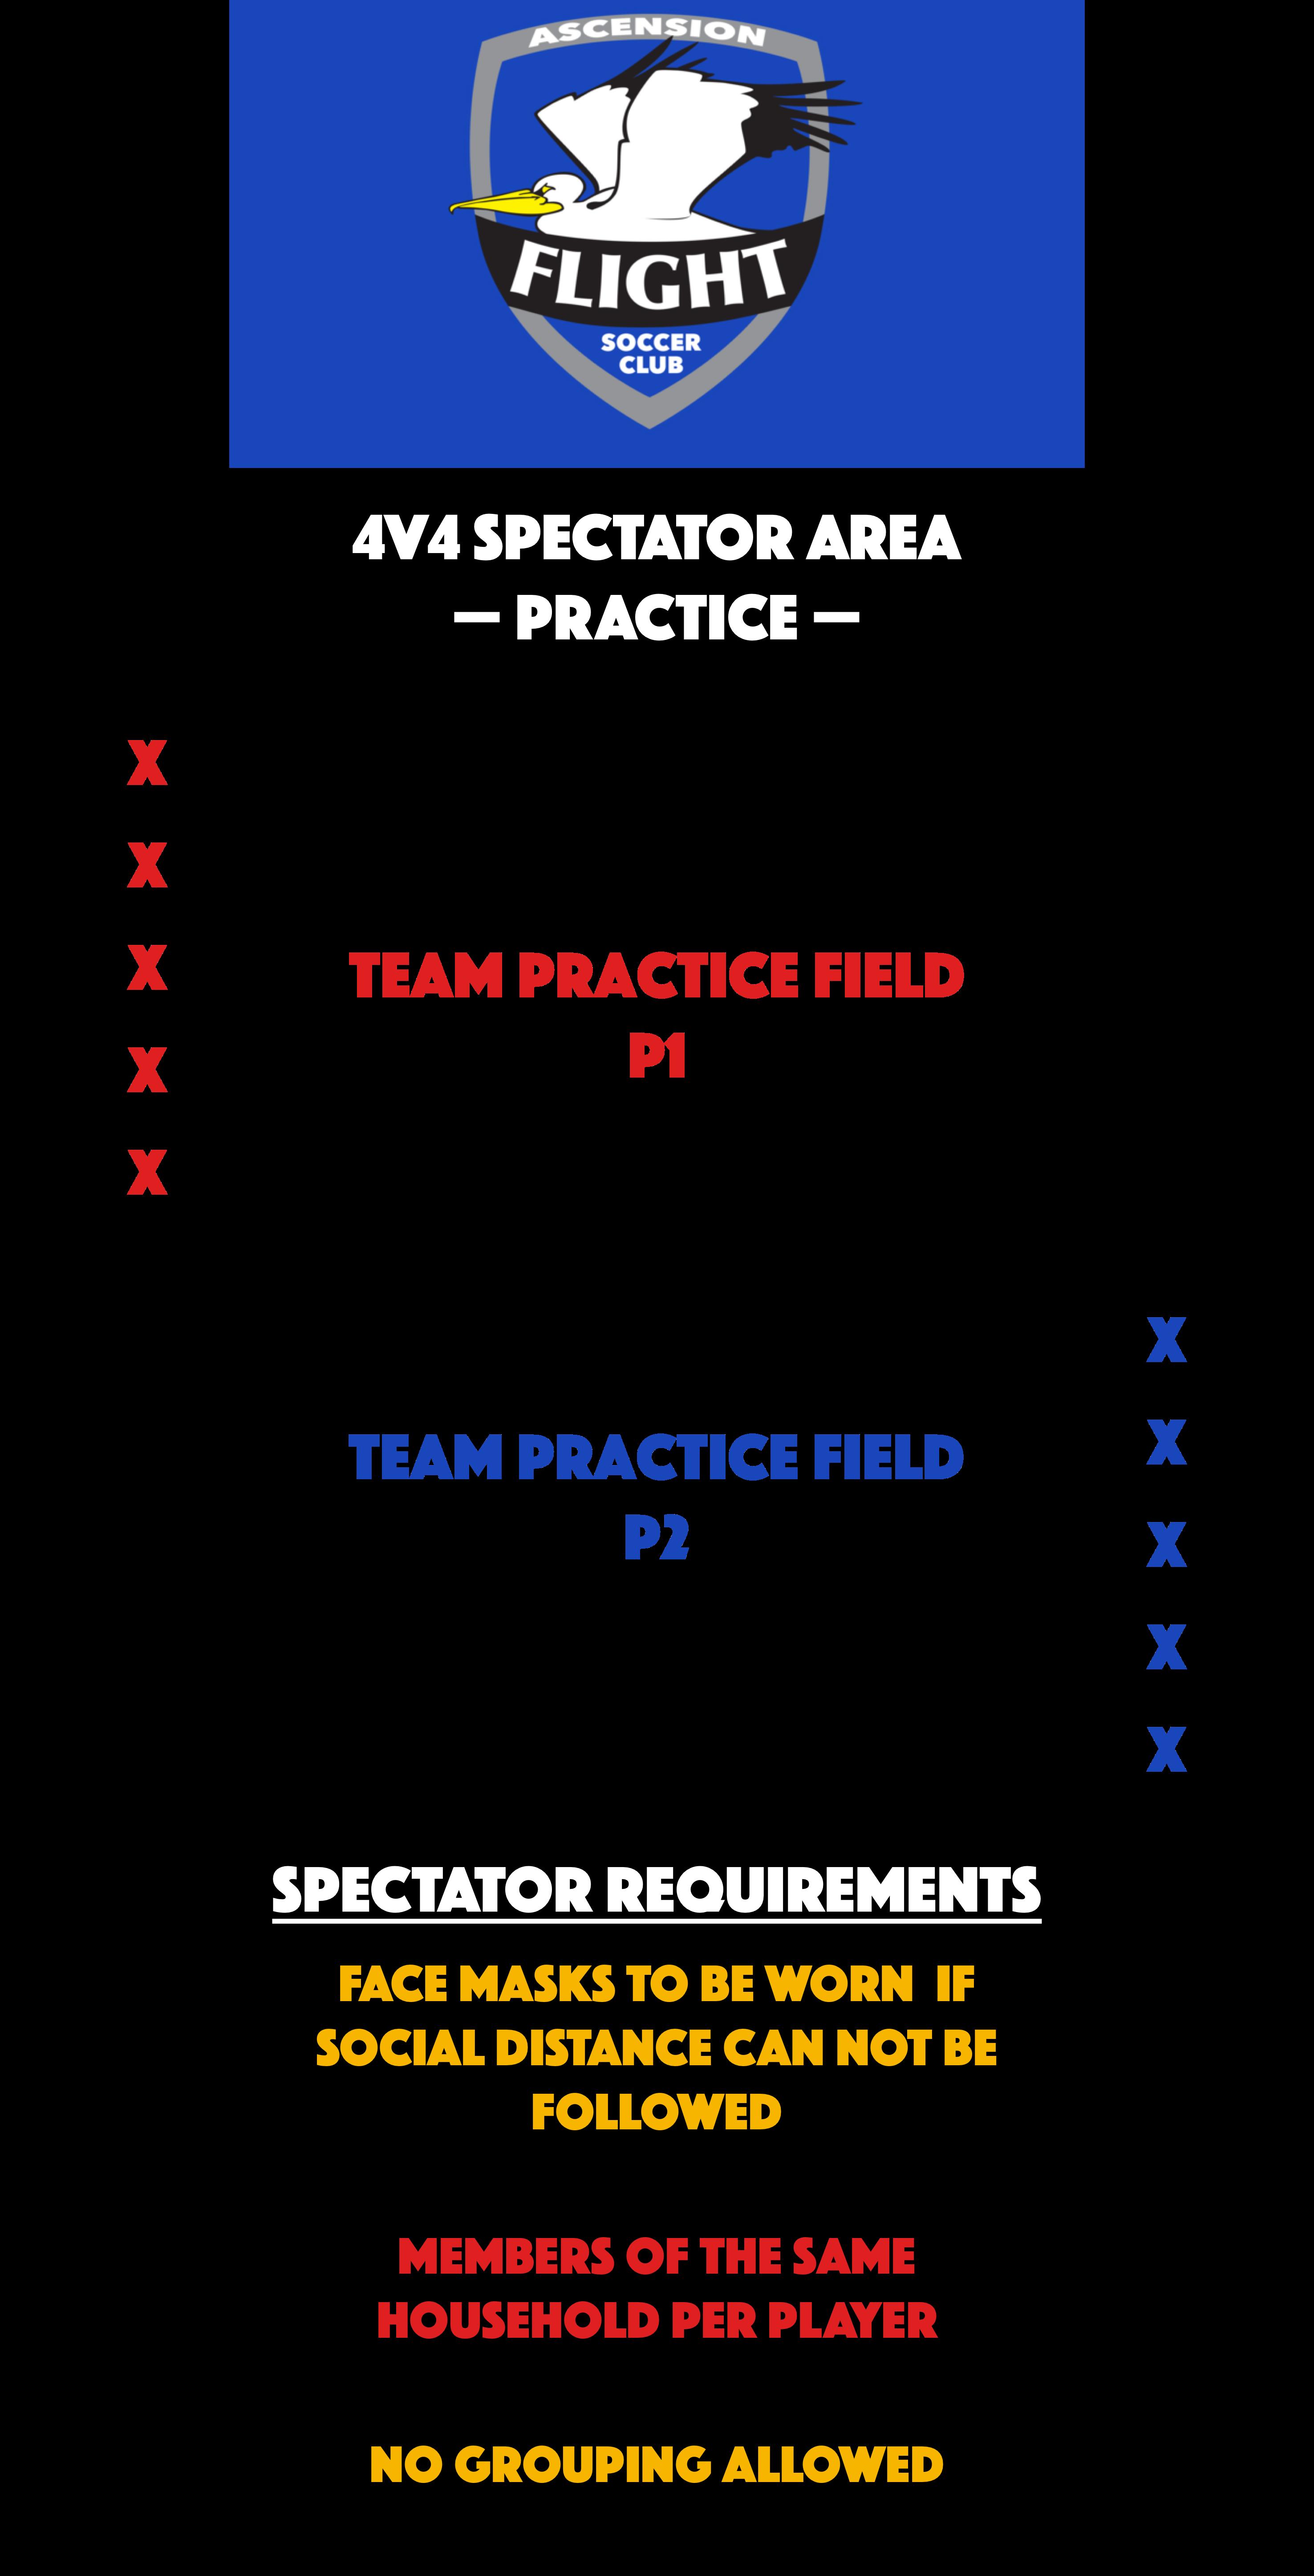 4v4 Spectator Area - Practice